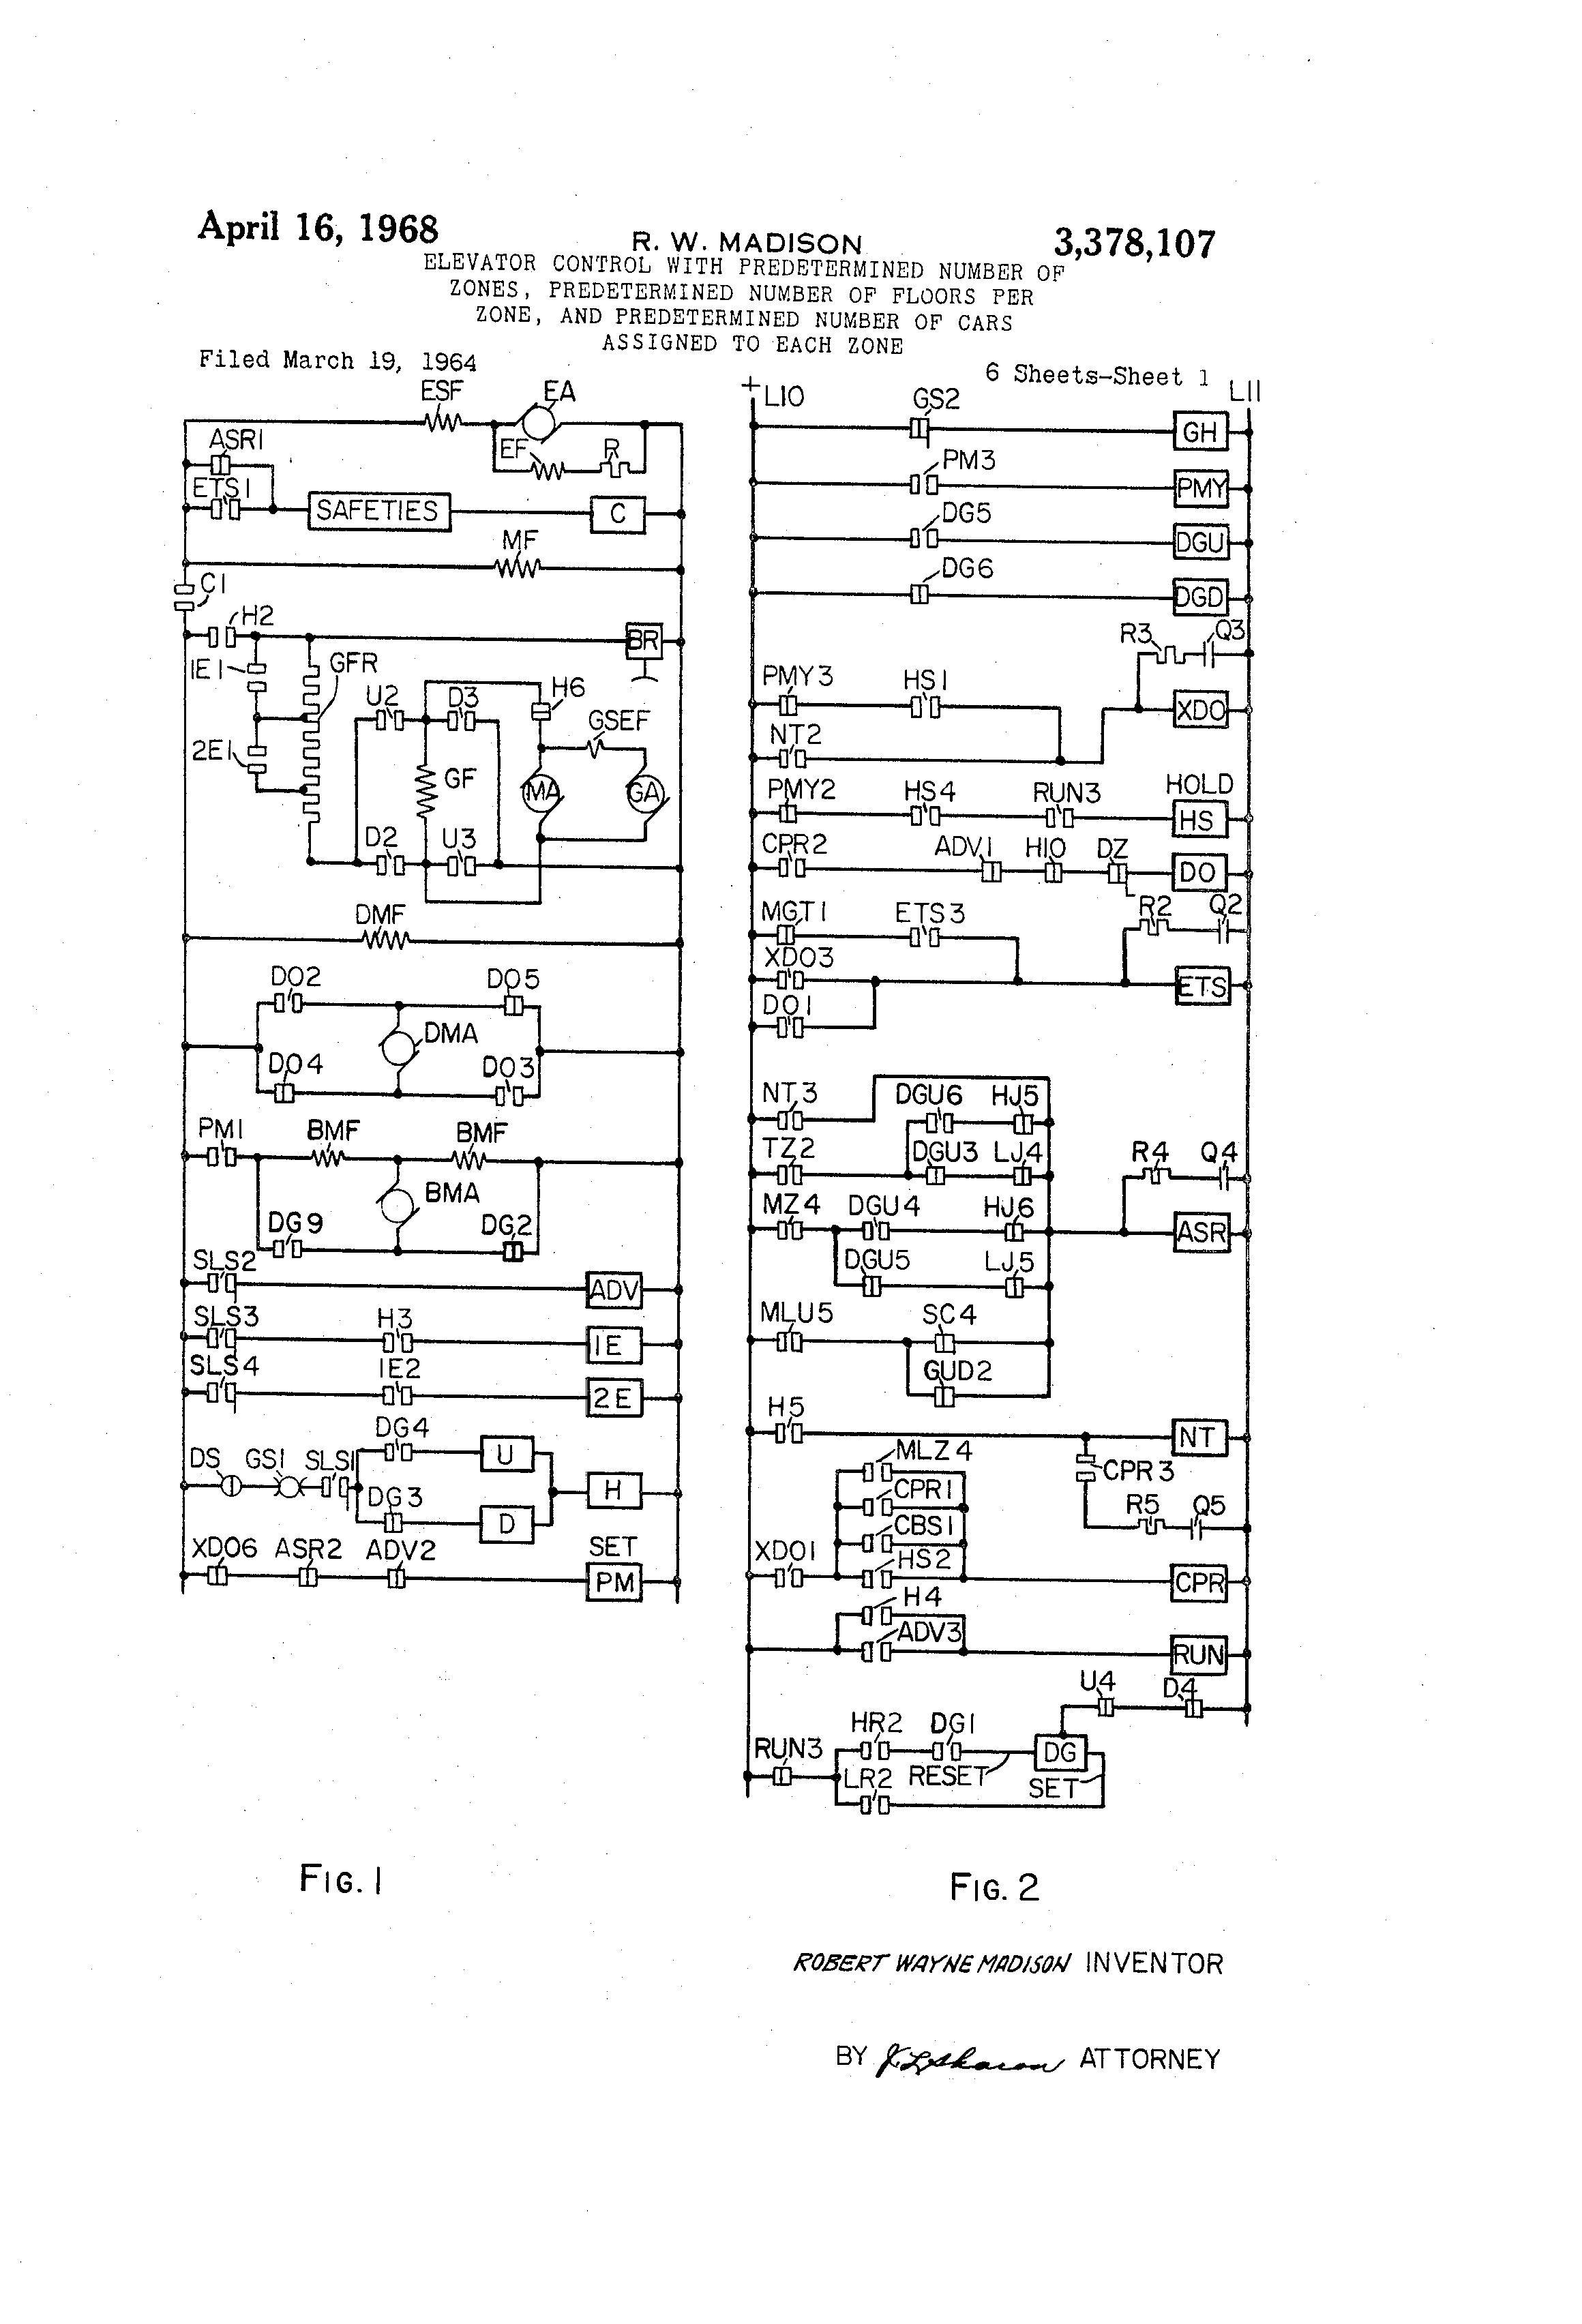 graffix eye wiring diagram